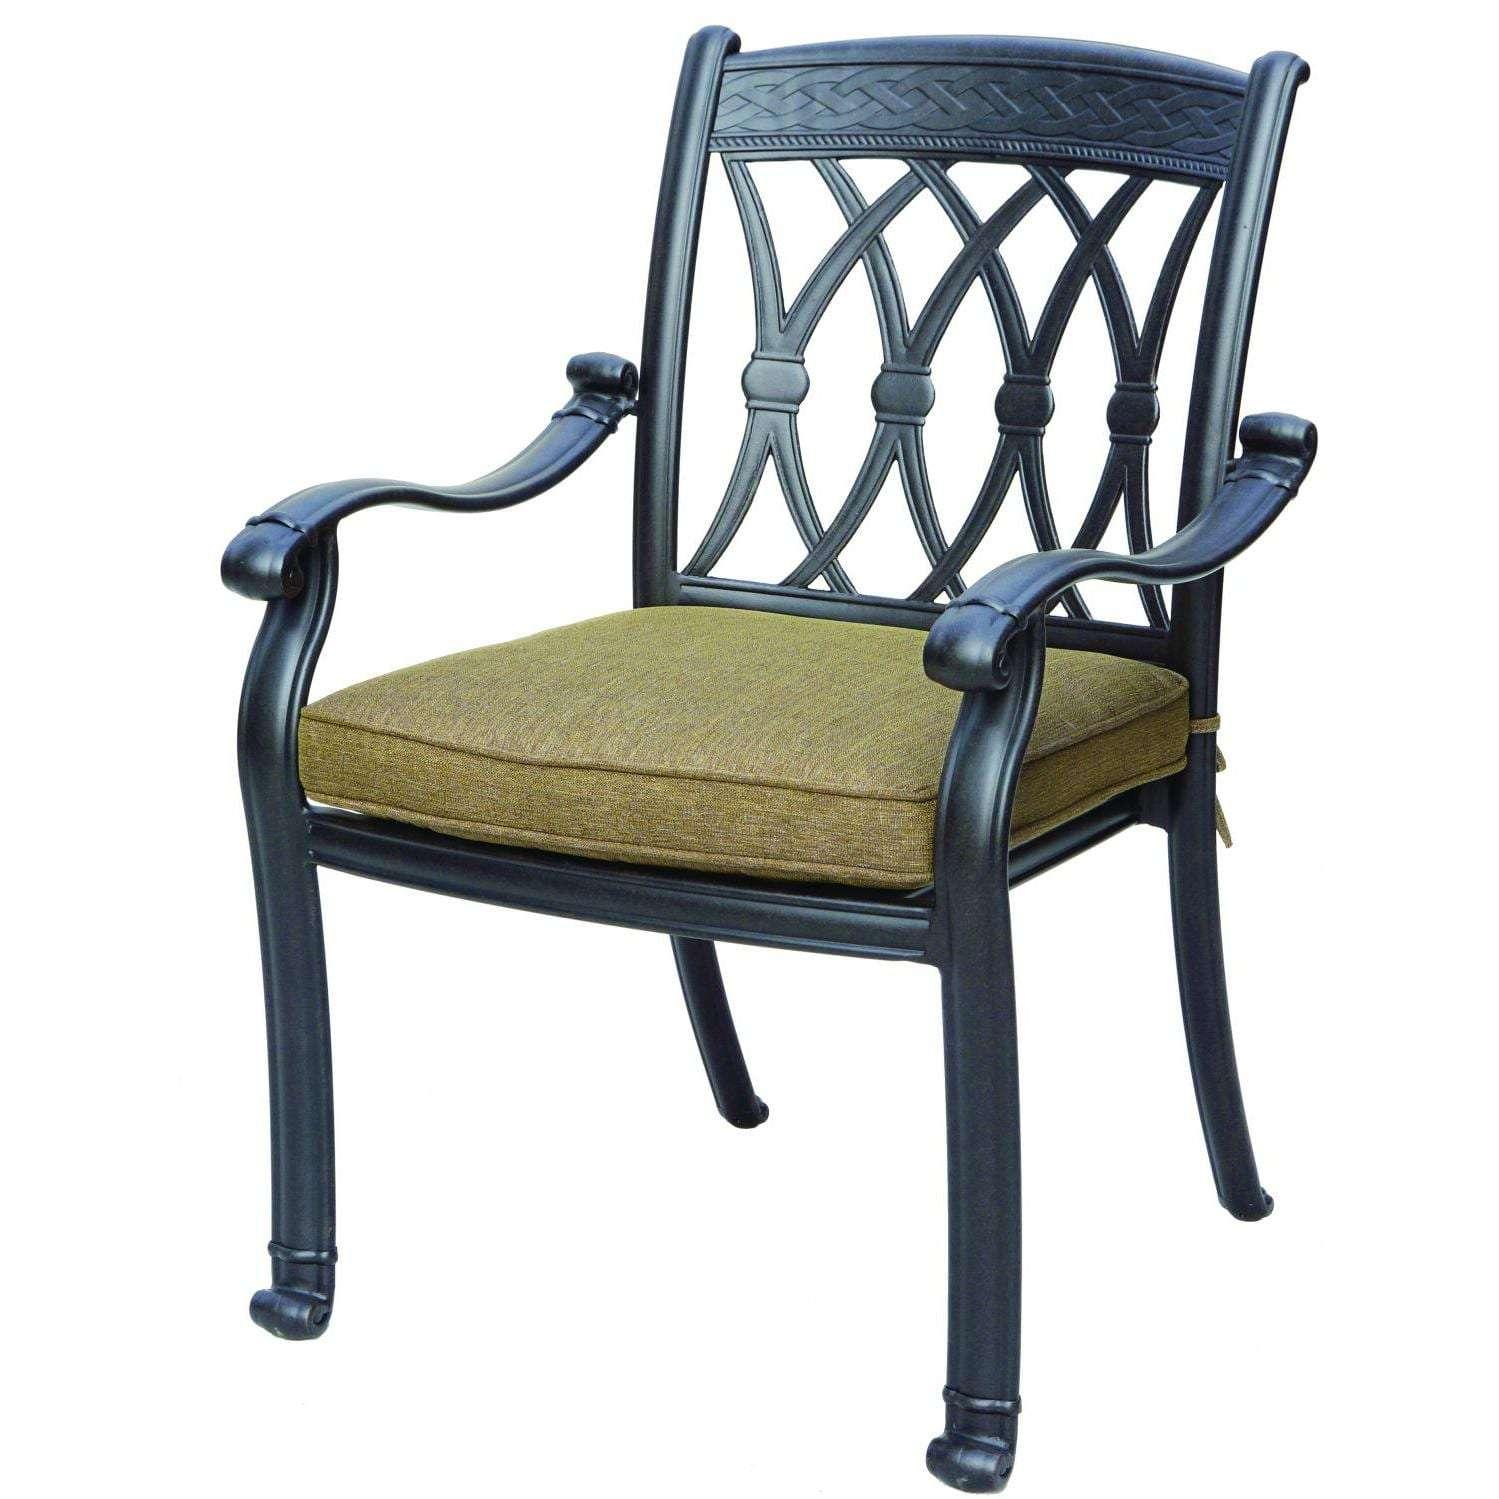 Darlee San Marcos Patio Dining Chair